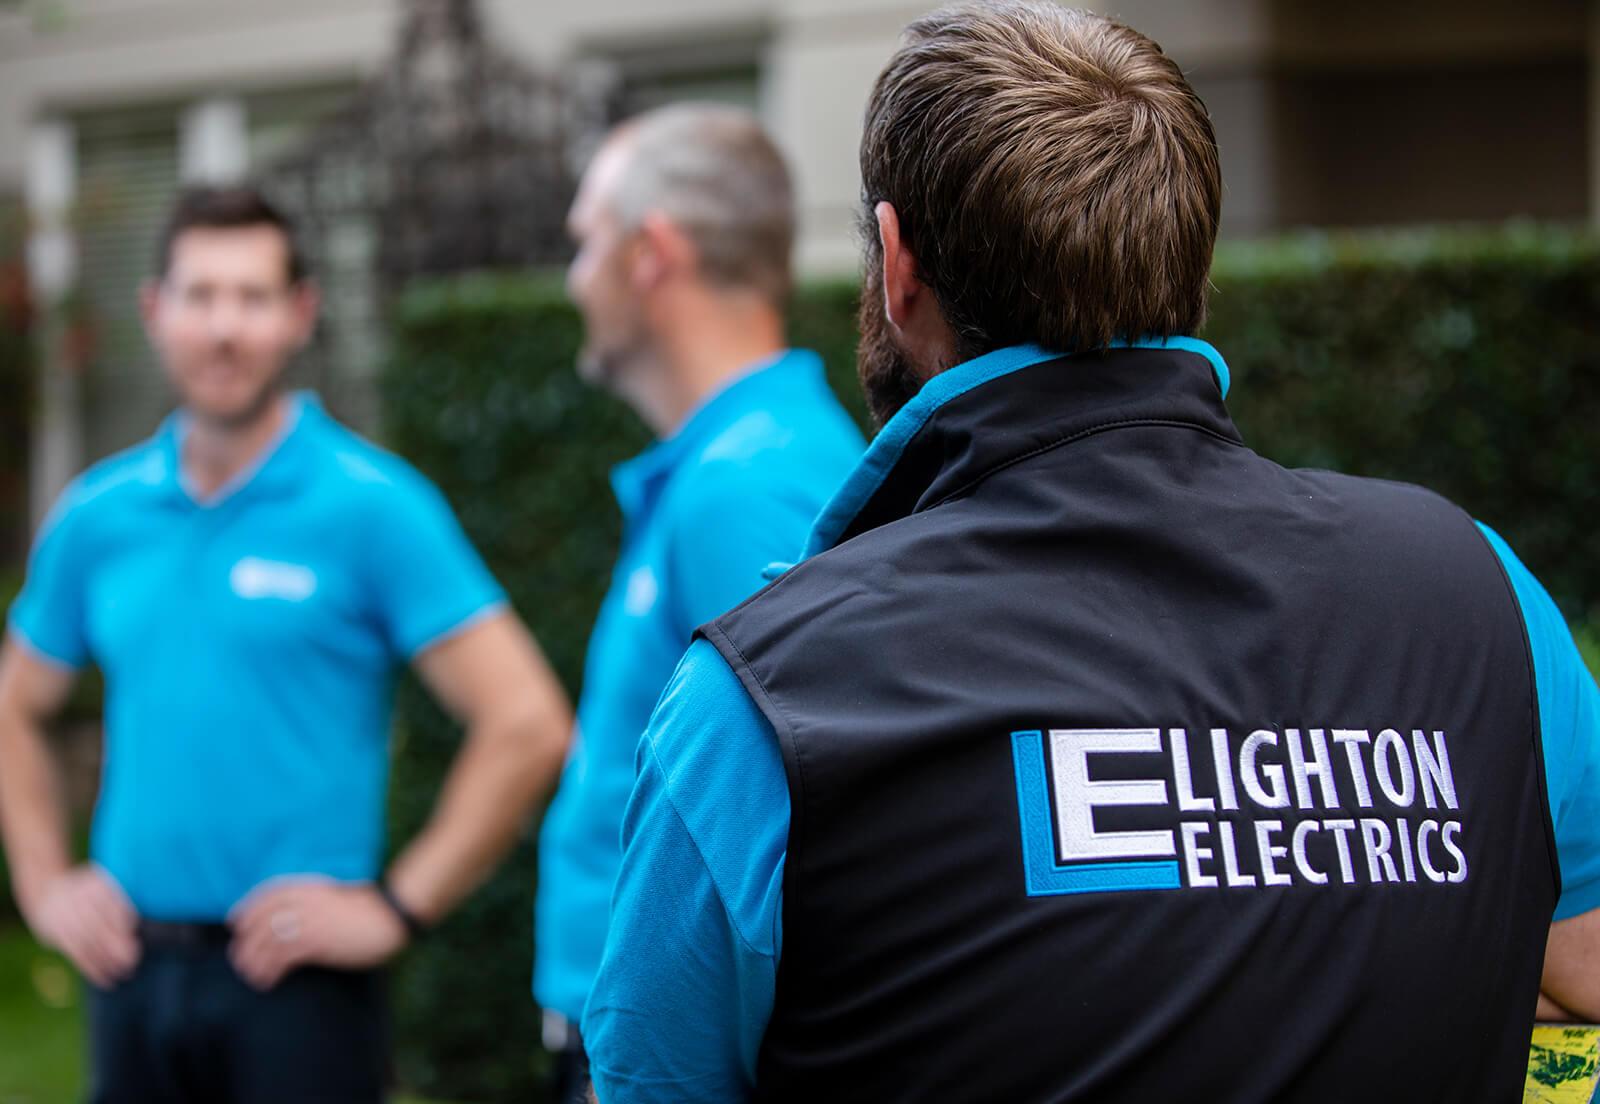 Lighton Electrics Trusted Electricians Home 4 Bg